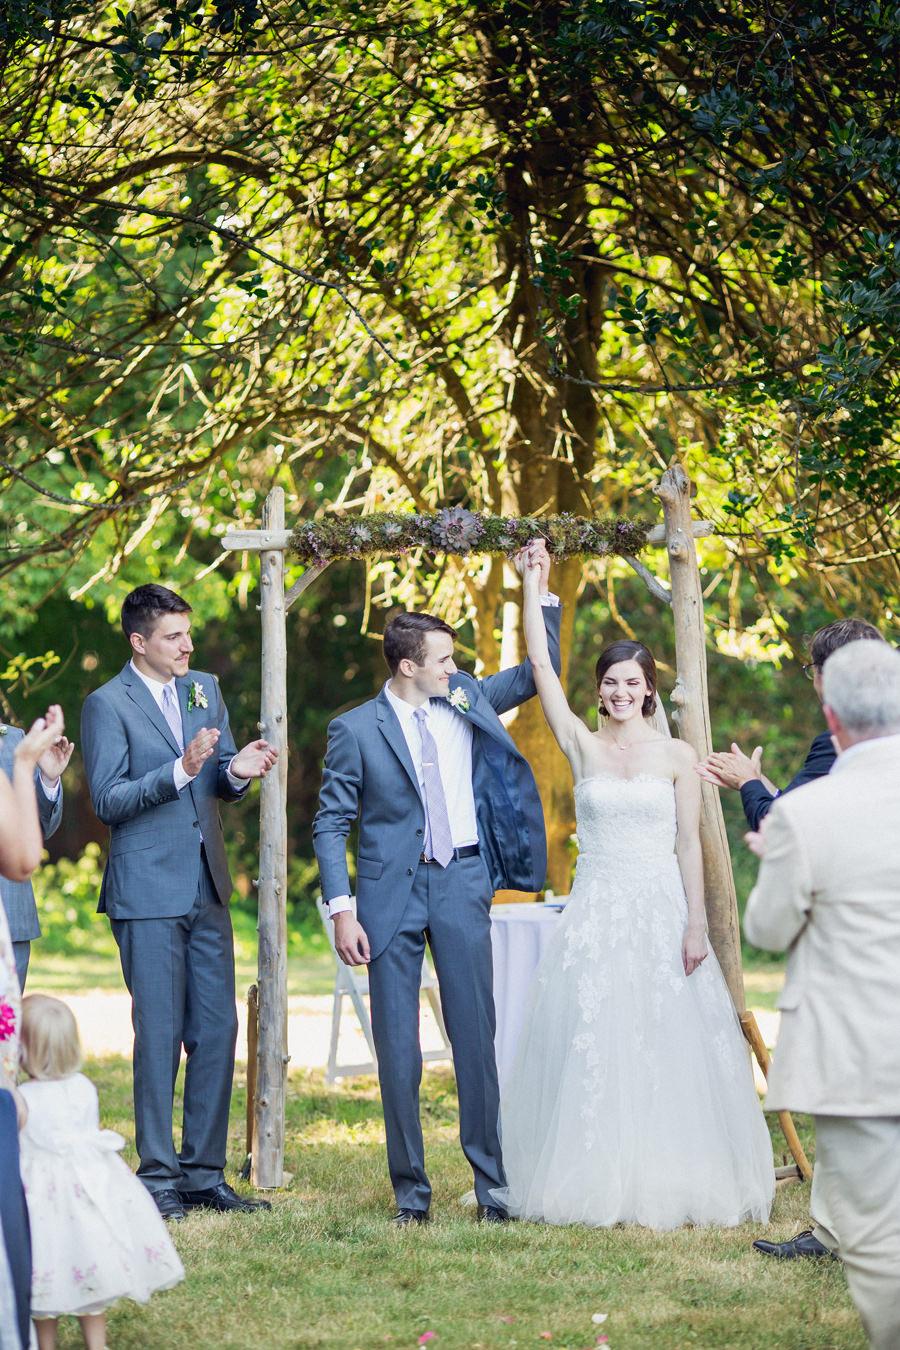 Queen Elizabeth Park Outdoor Wedding Ceremony